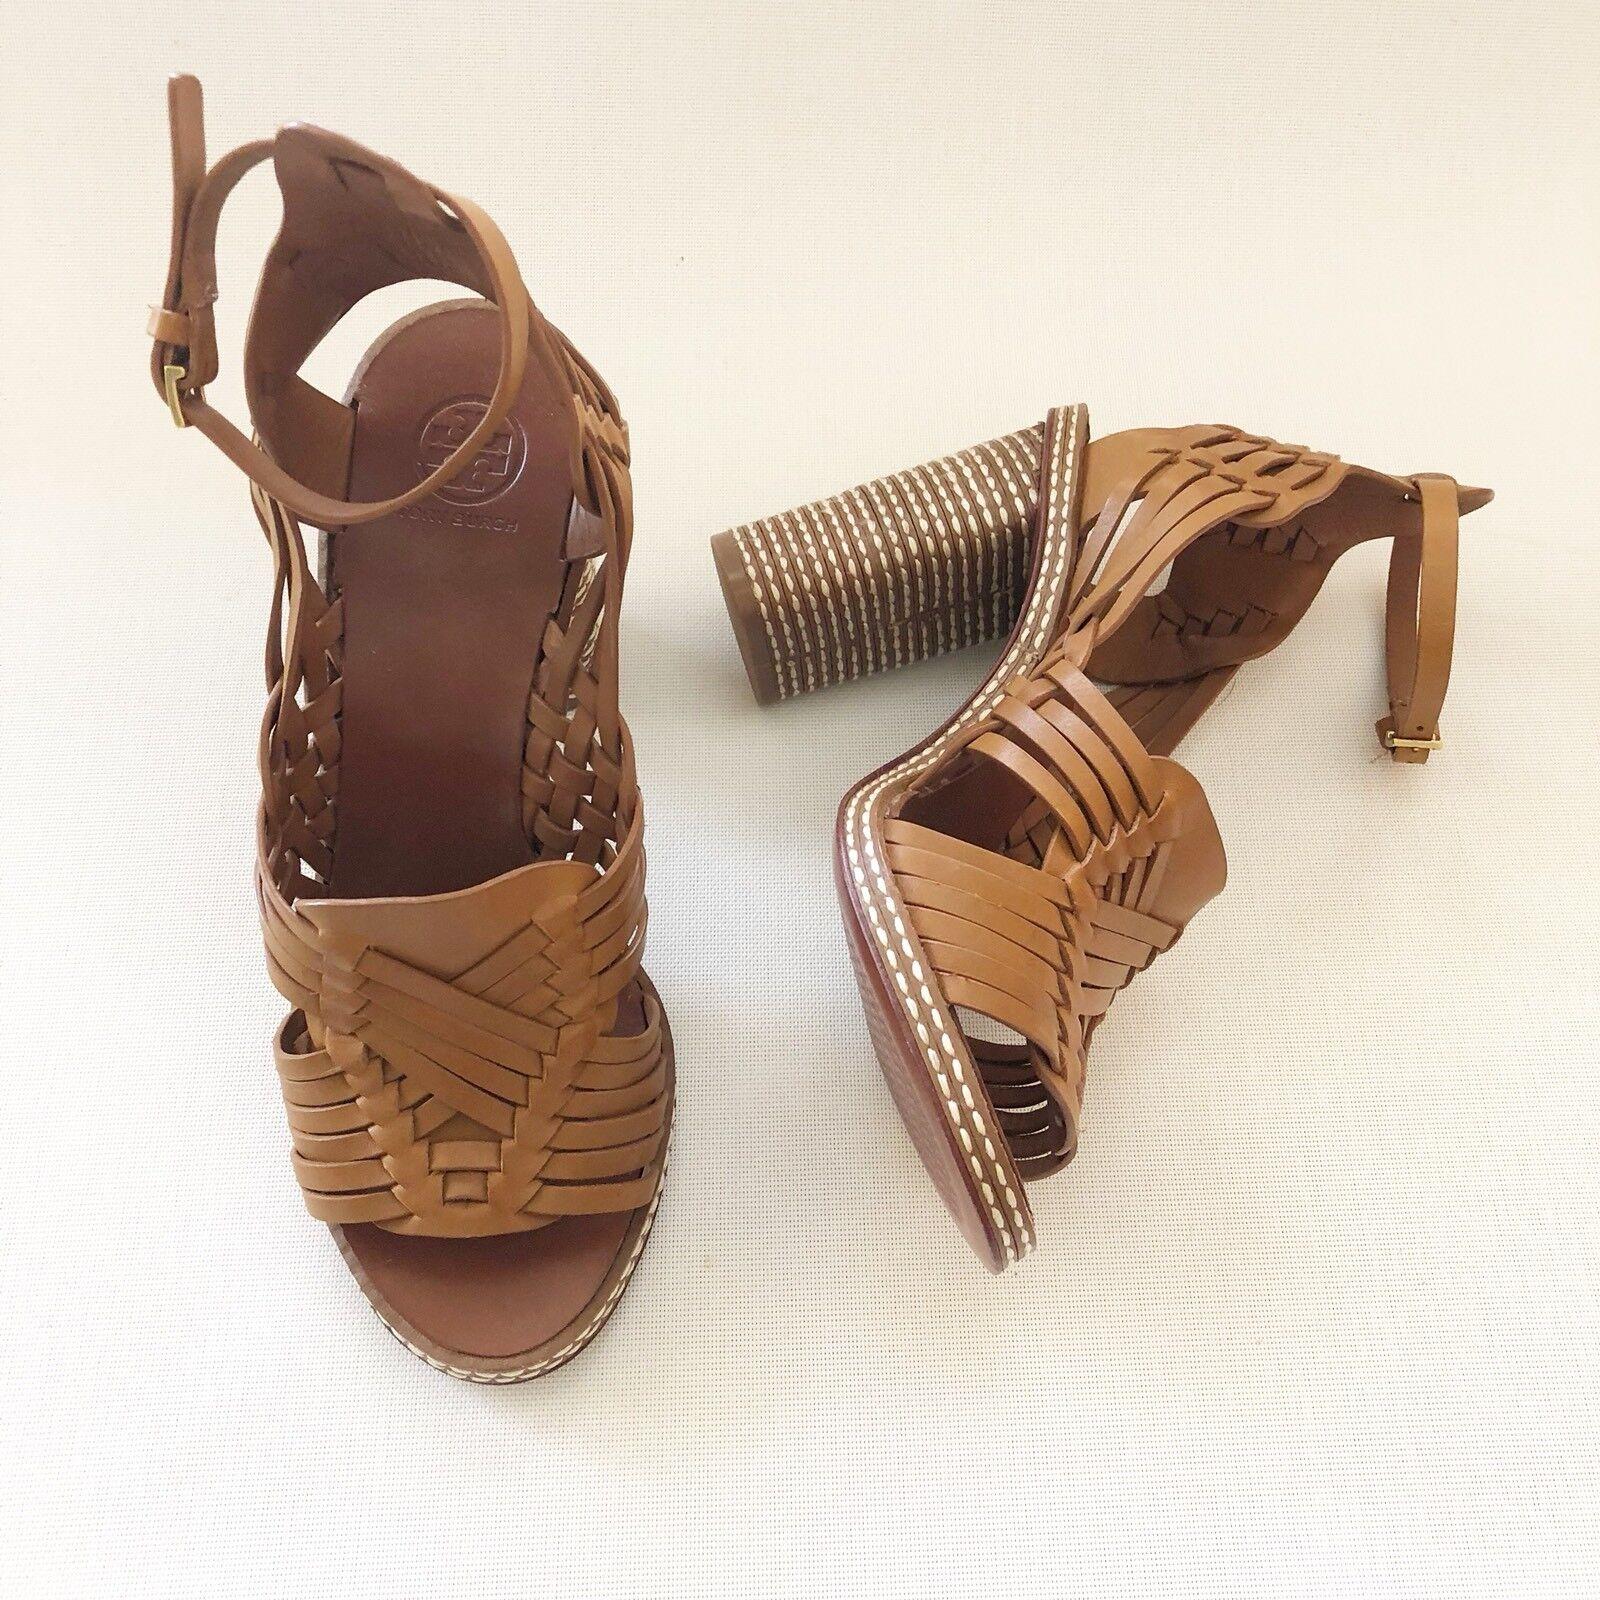 Donna's Tory Burch Pecha High Heel Pelle Sandals Size 8 NEW!